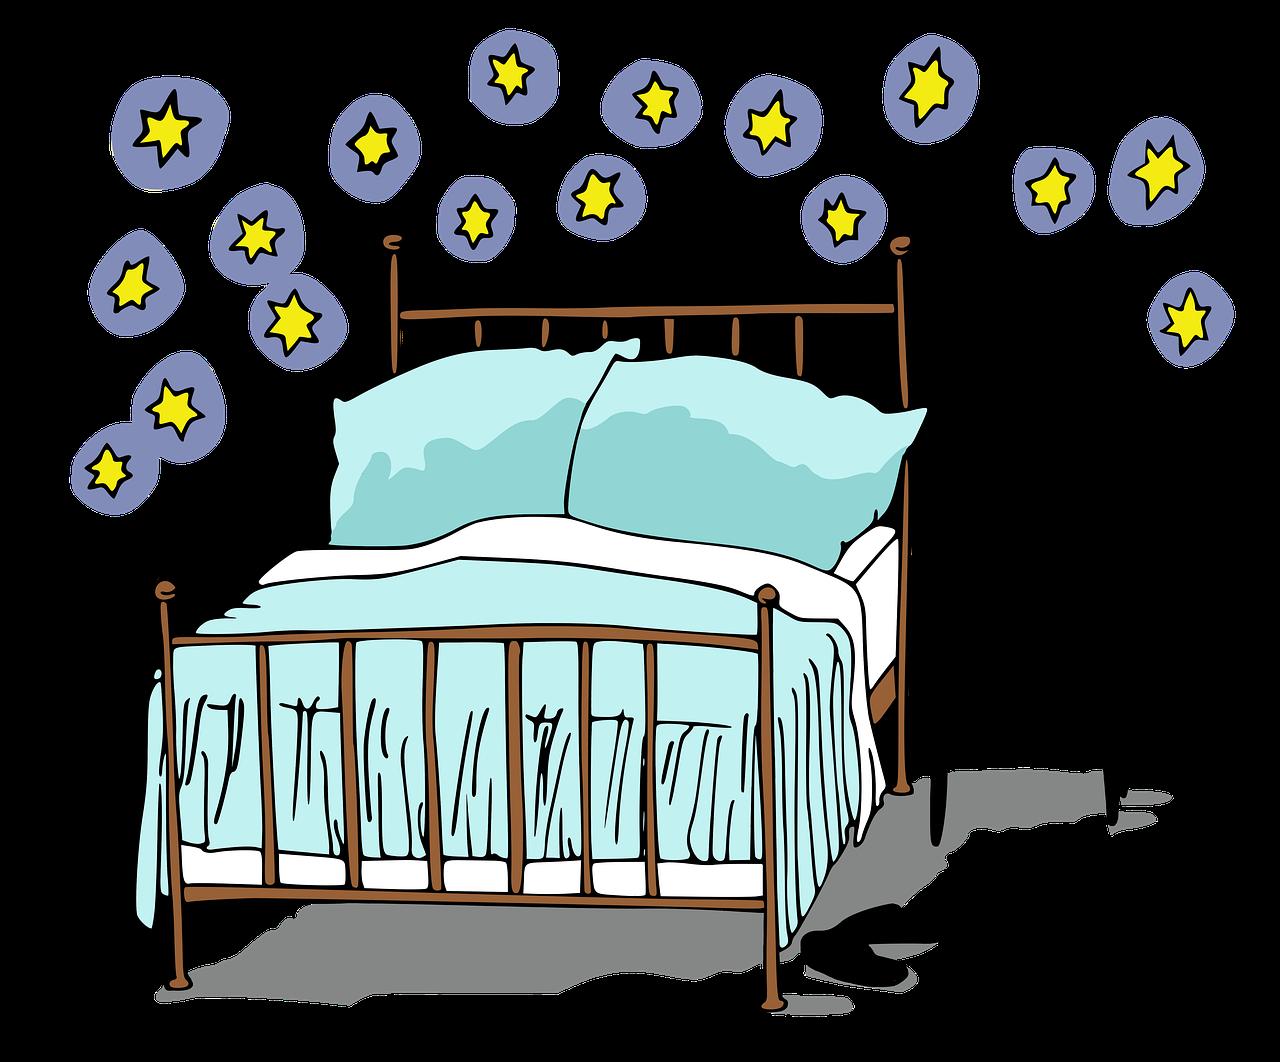 Bed Sleep Bedroom Pillow Furniture  - ArtRose / Pixabay